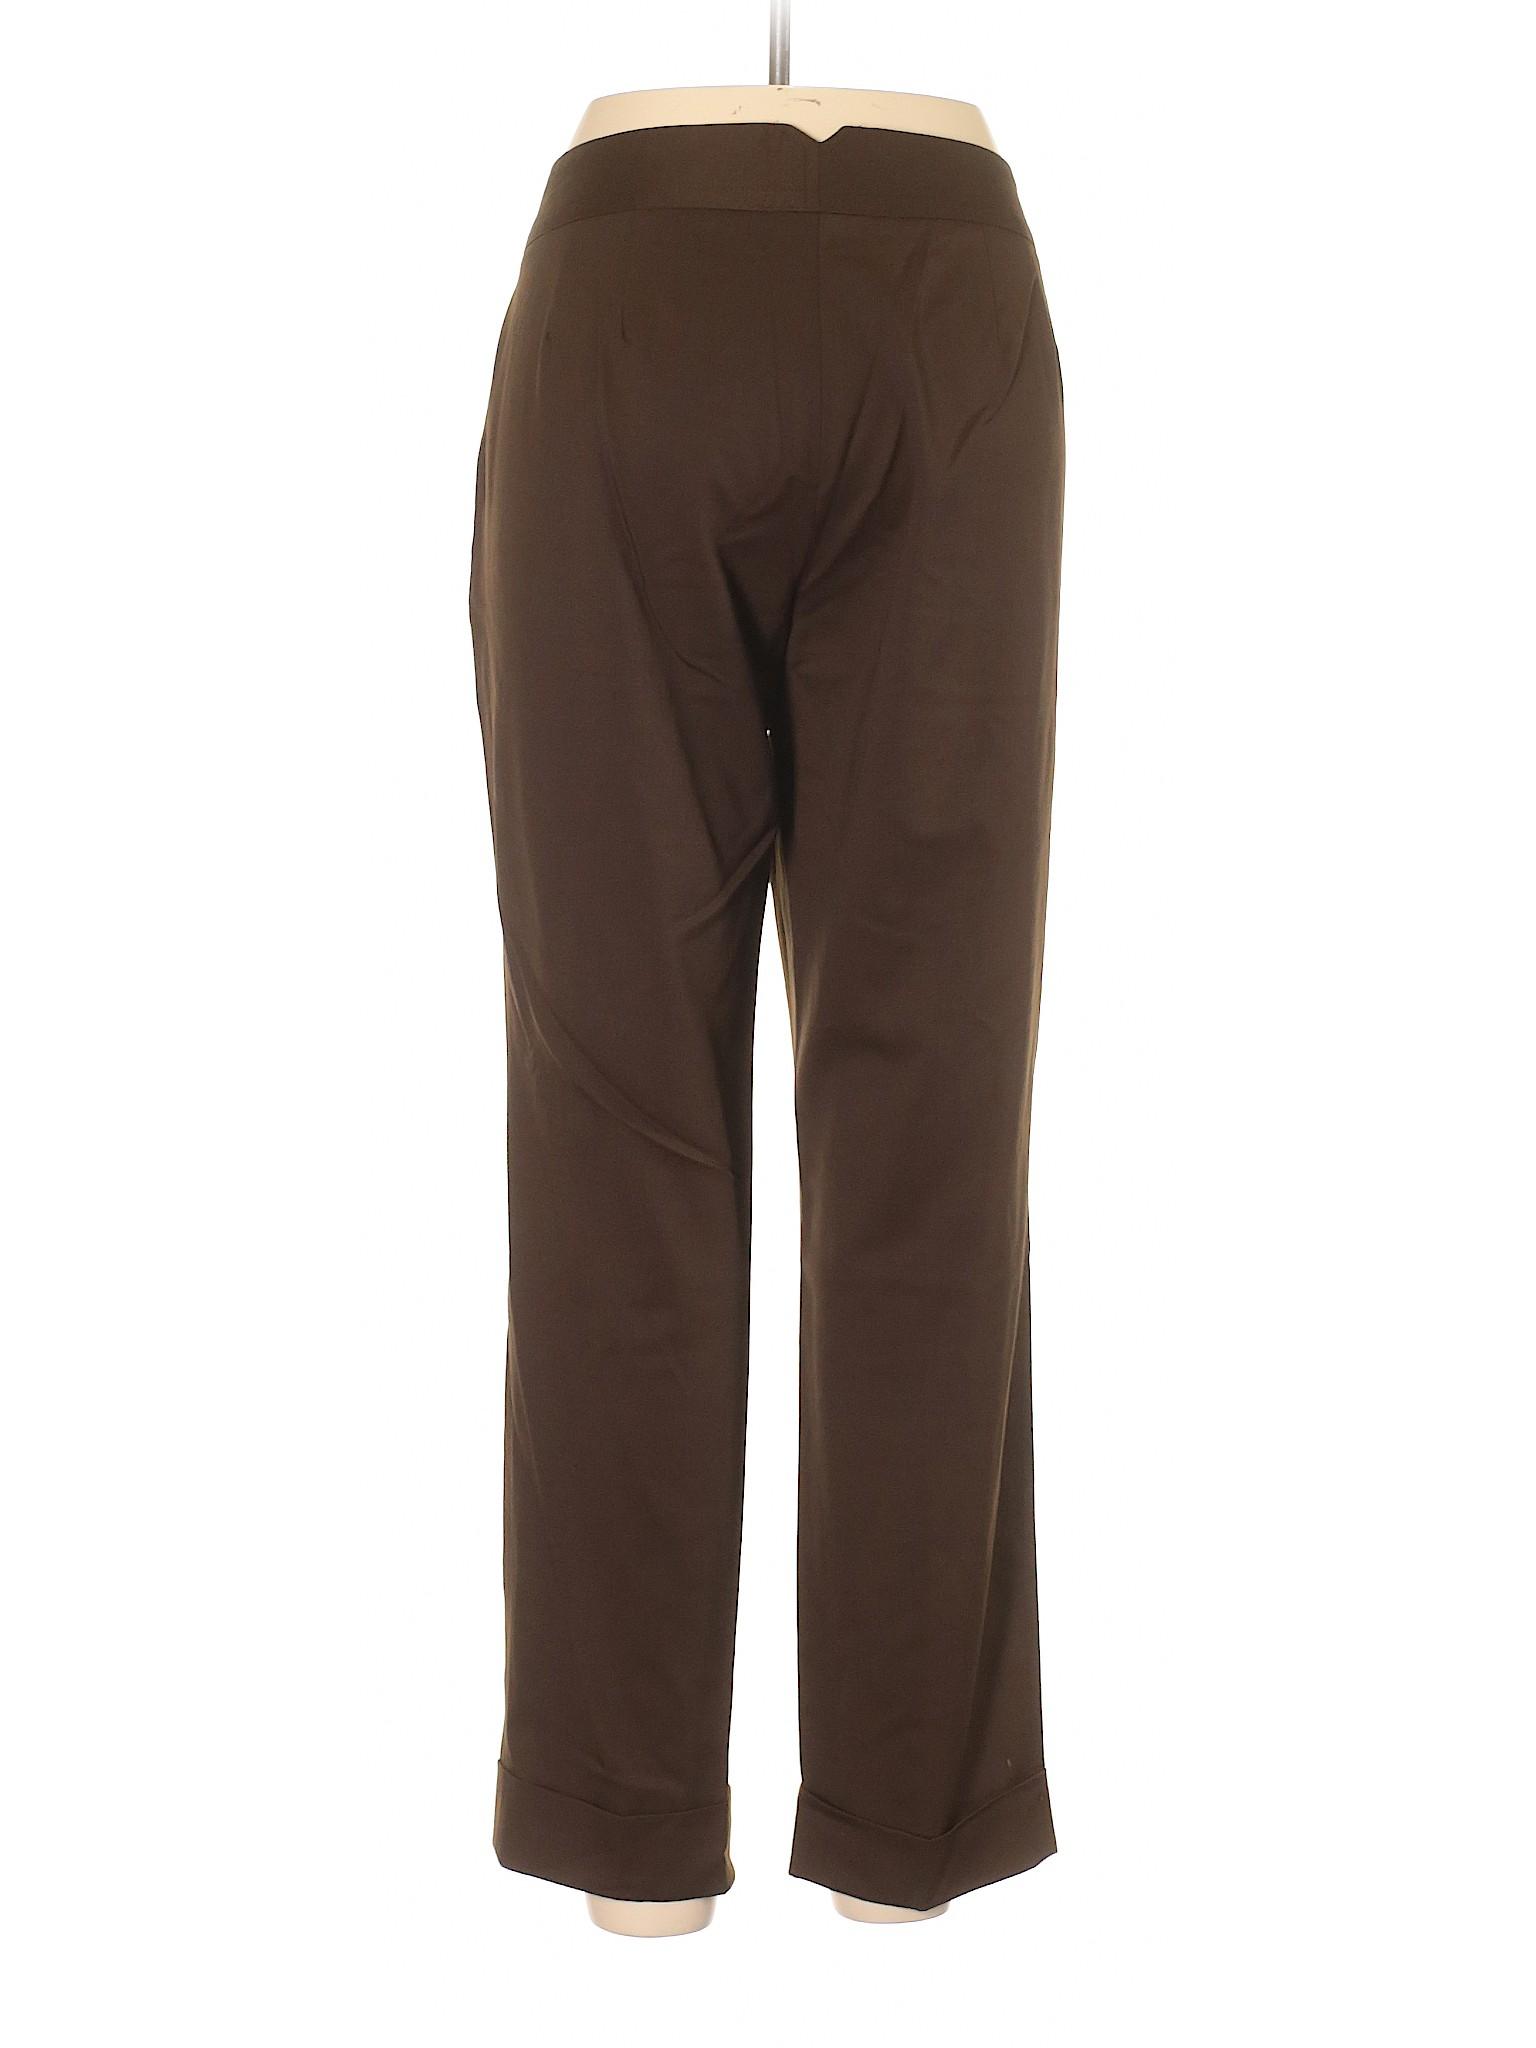 Pants Faconnable Boutique Boutique leisure Wool leisure 8qOwHtwxXf